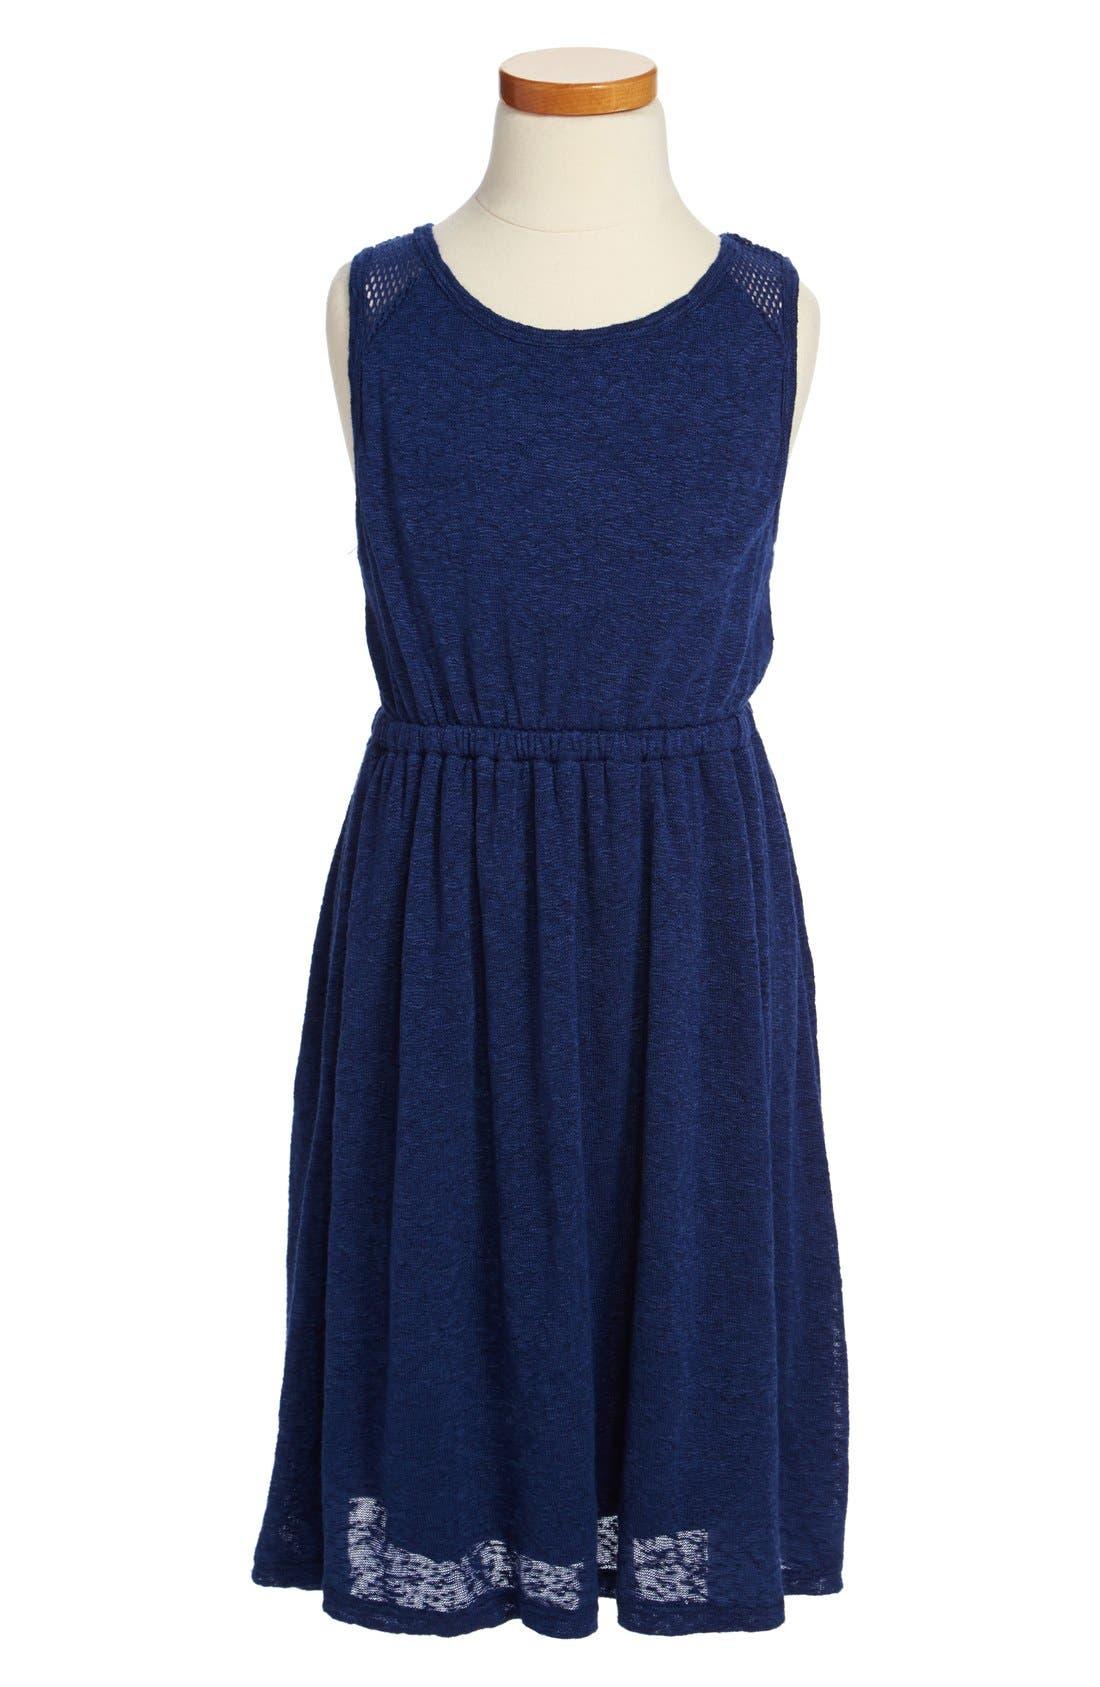 Alternate Image 1 Selected - Ella Moss Tank Dress (Big Girls)